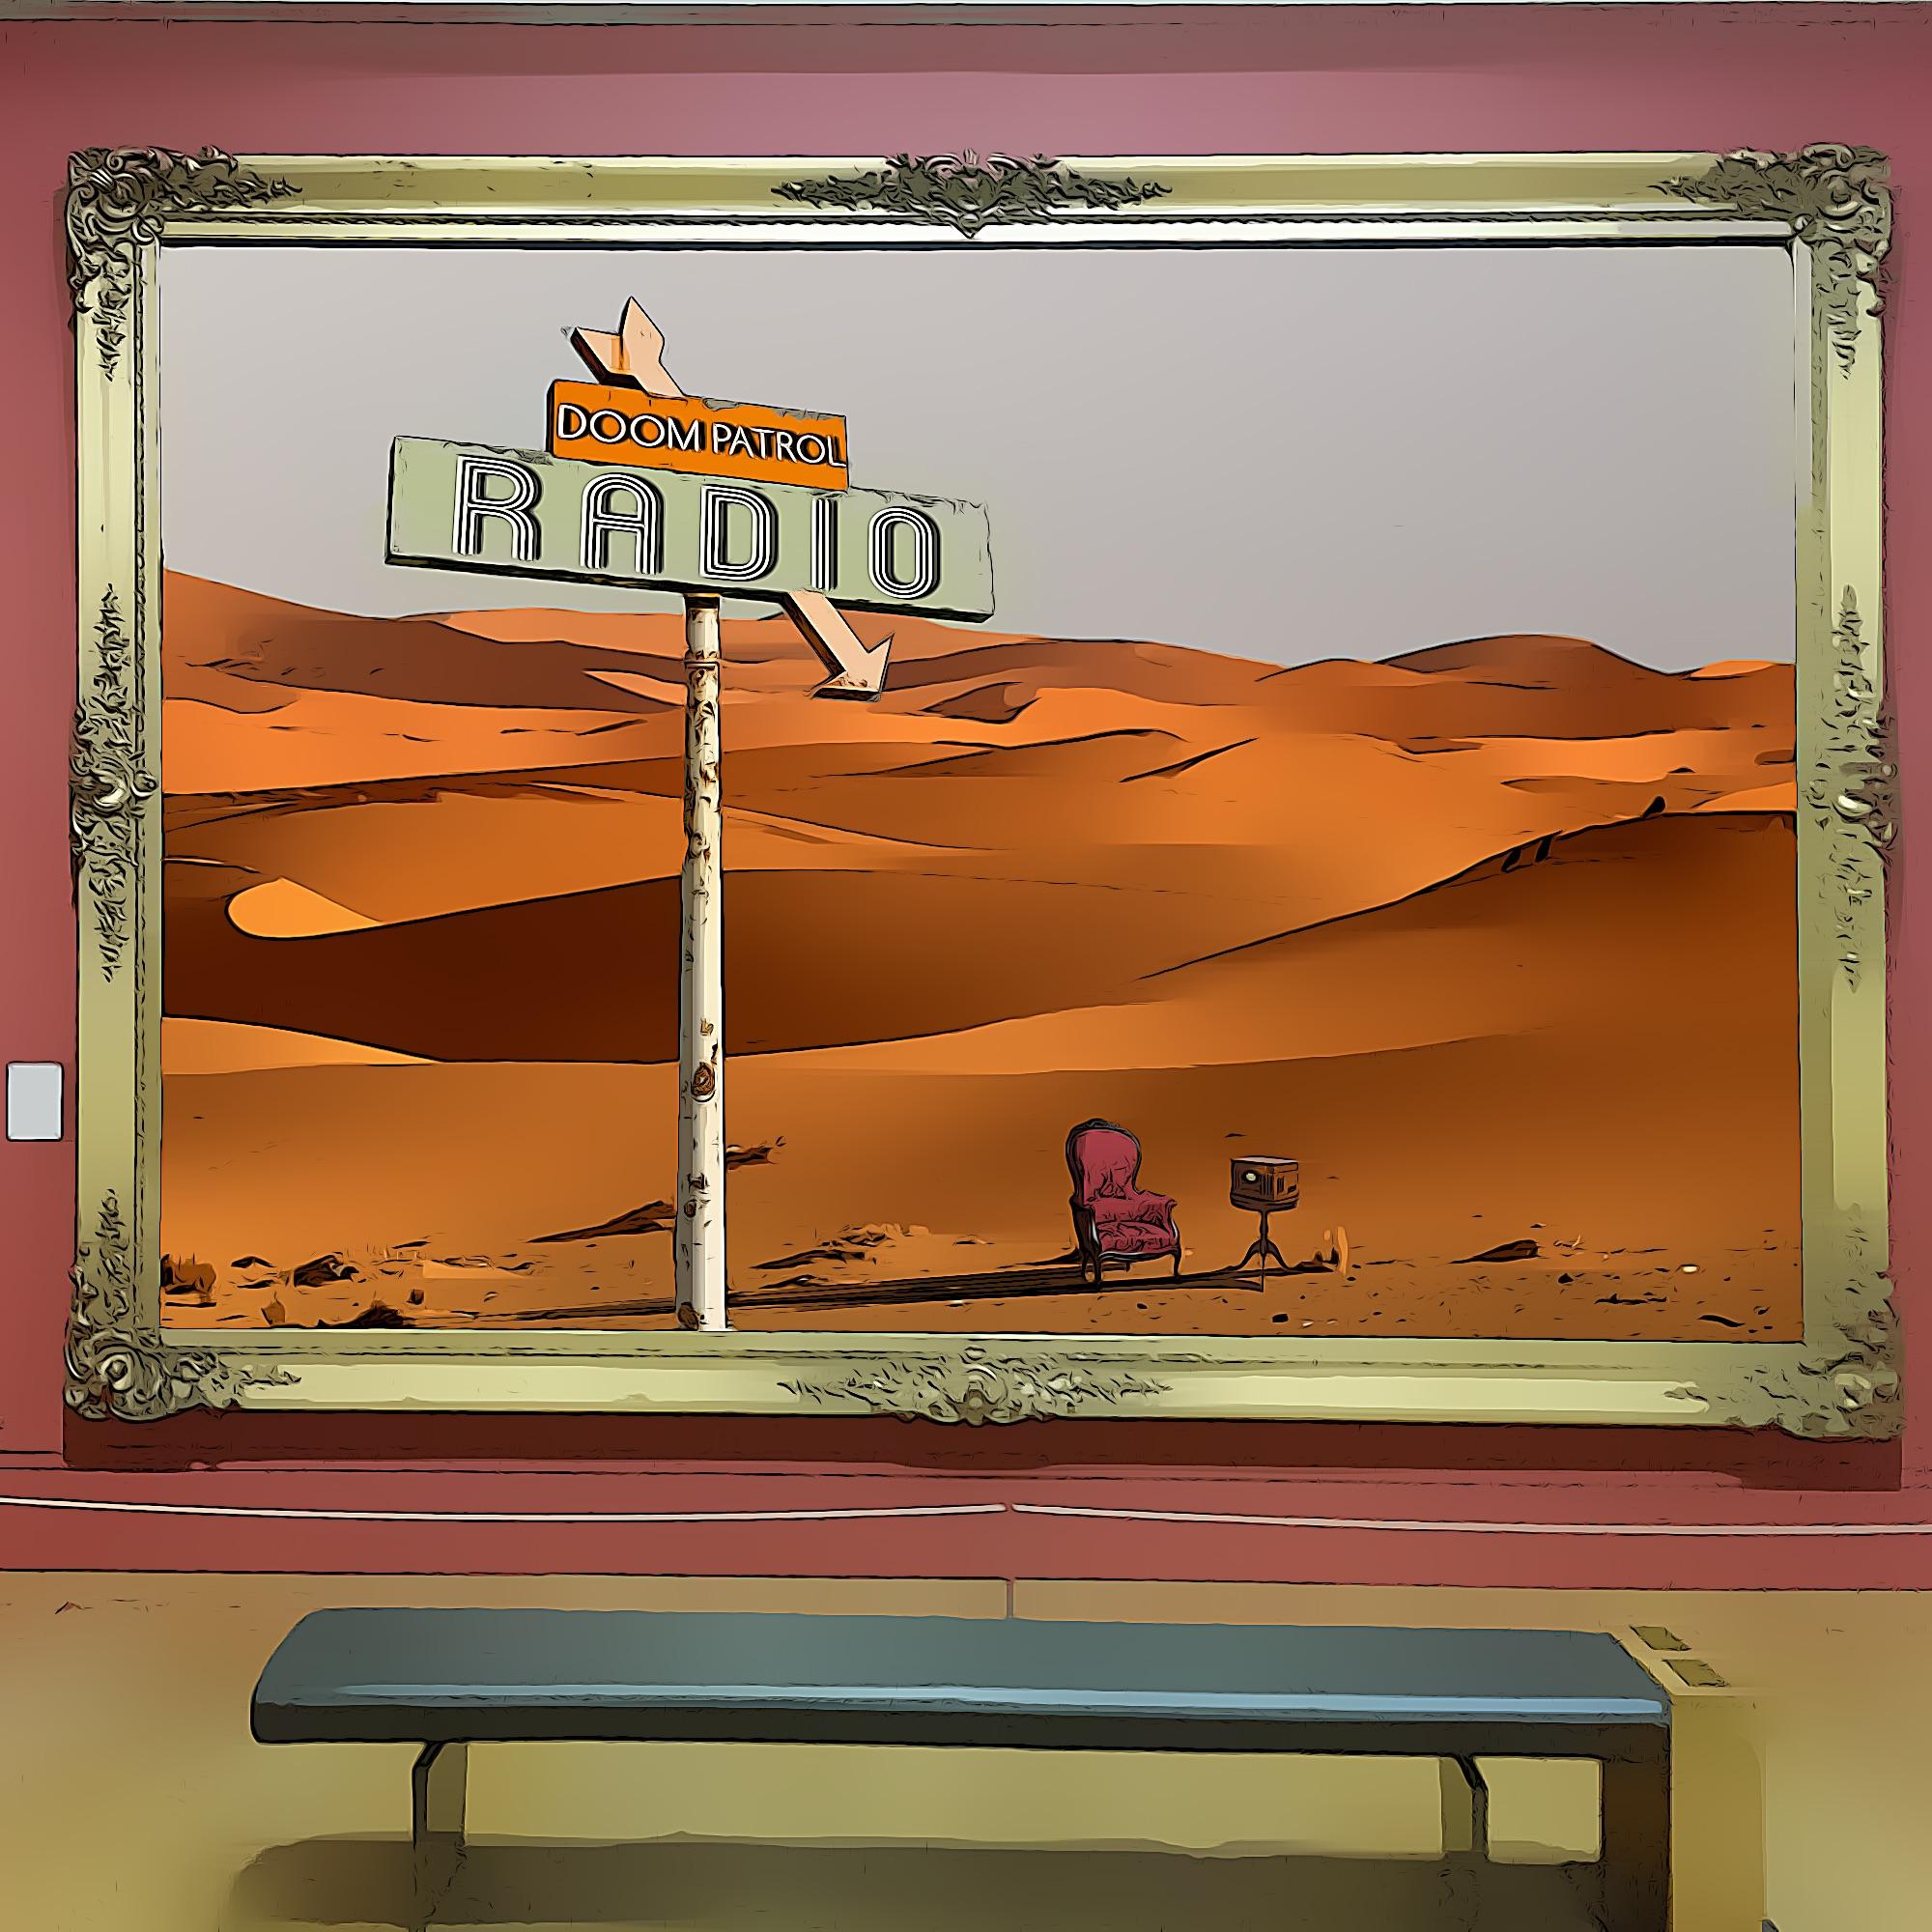 Doom Patrol Radio show art